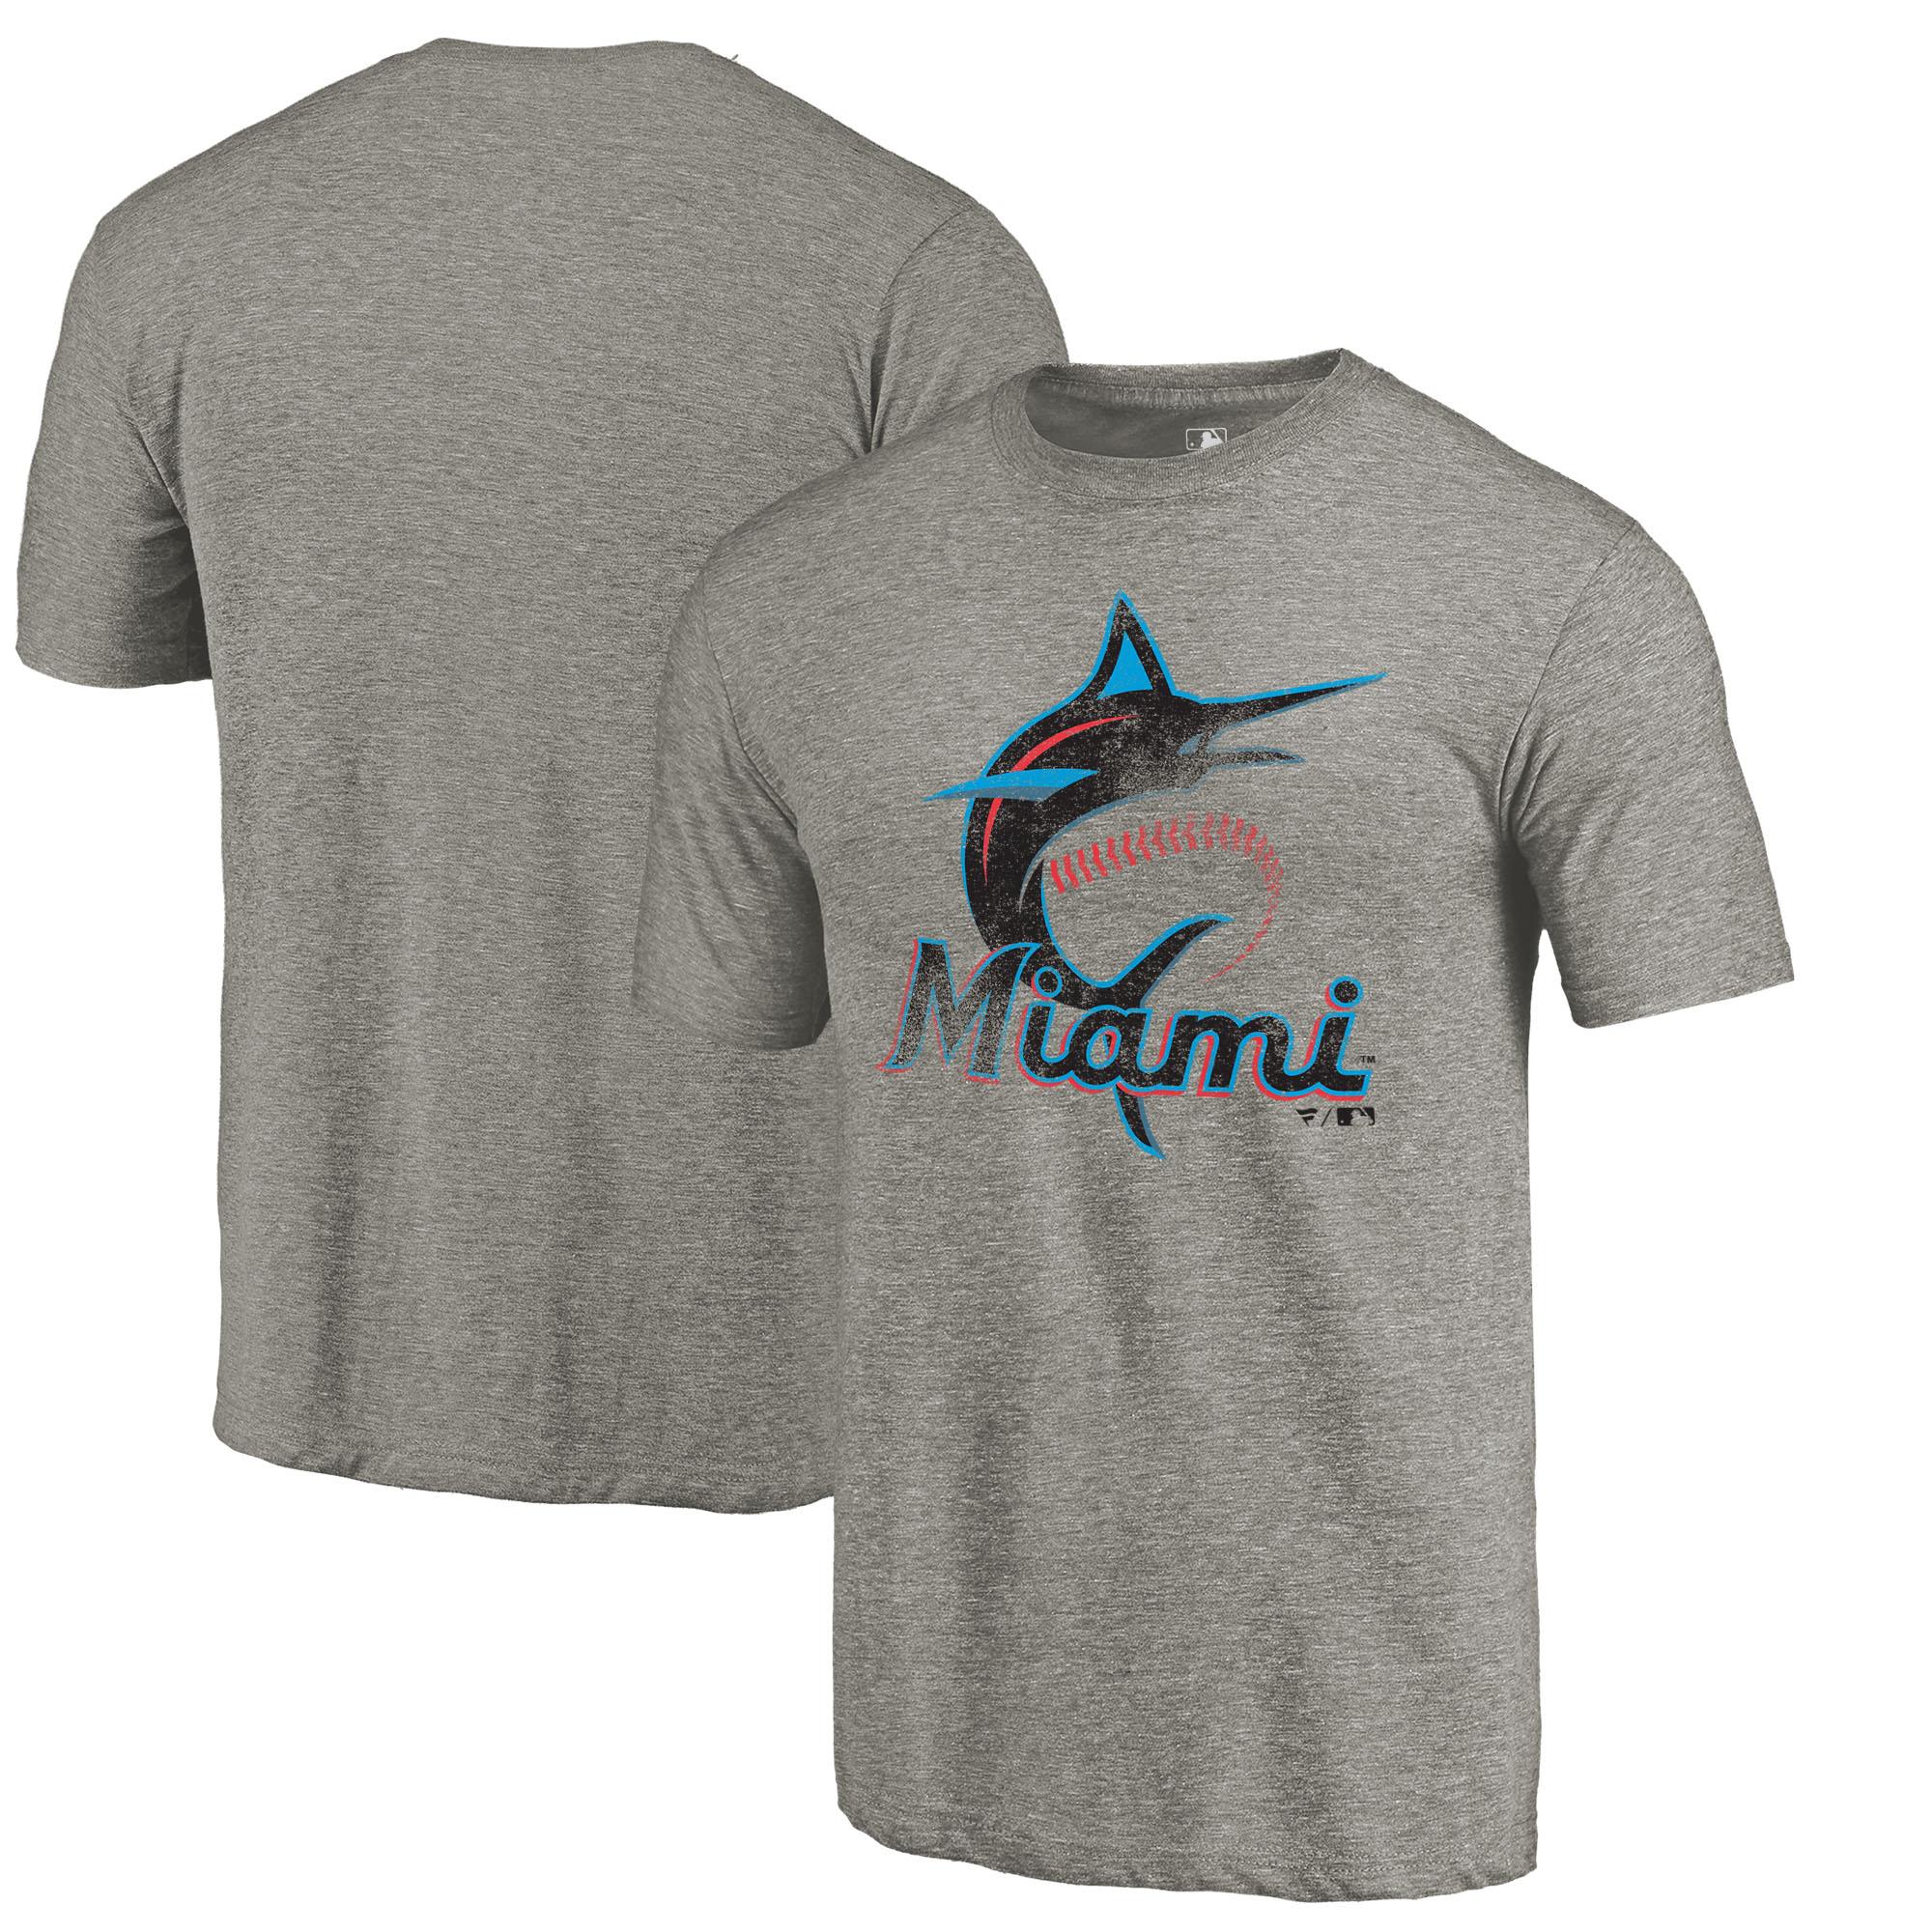 Miami Marlins Distressed Team Tri-Blend T-Shirt - Ash